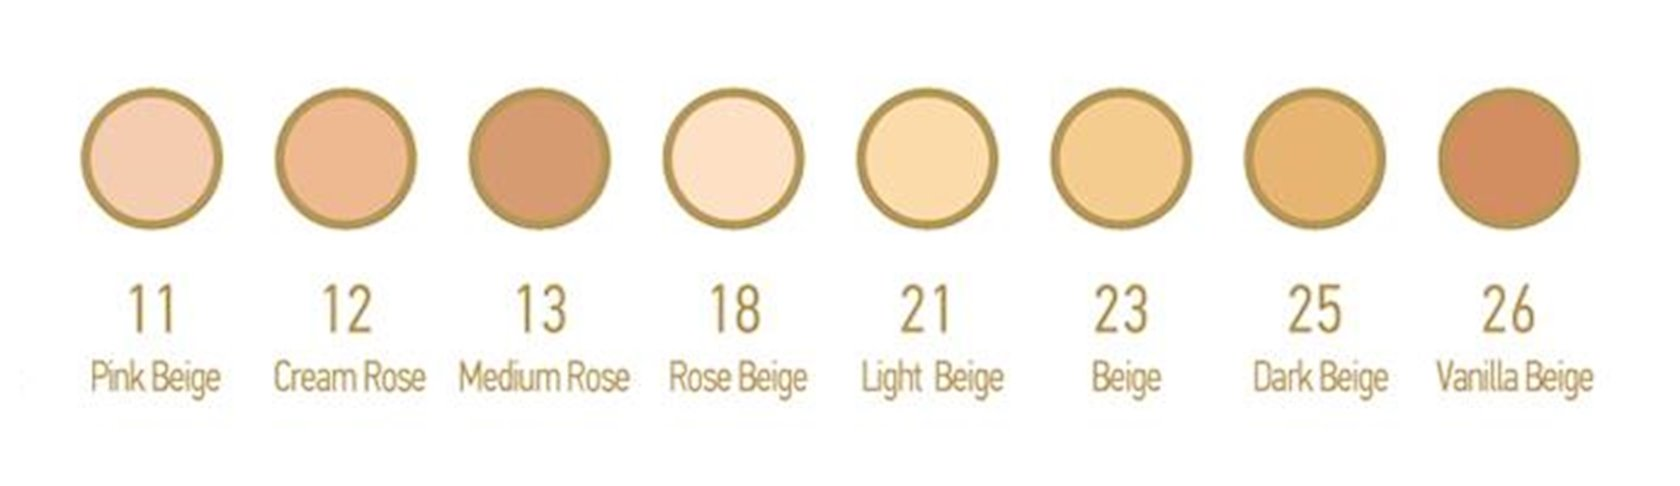 Kompakt krem-kirşan Catalina Geo Skin Cover 13 Medium Rose, 13 q